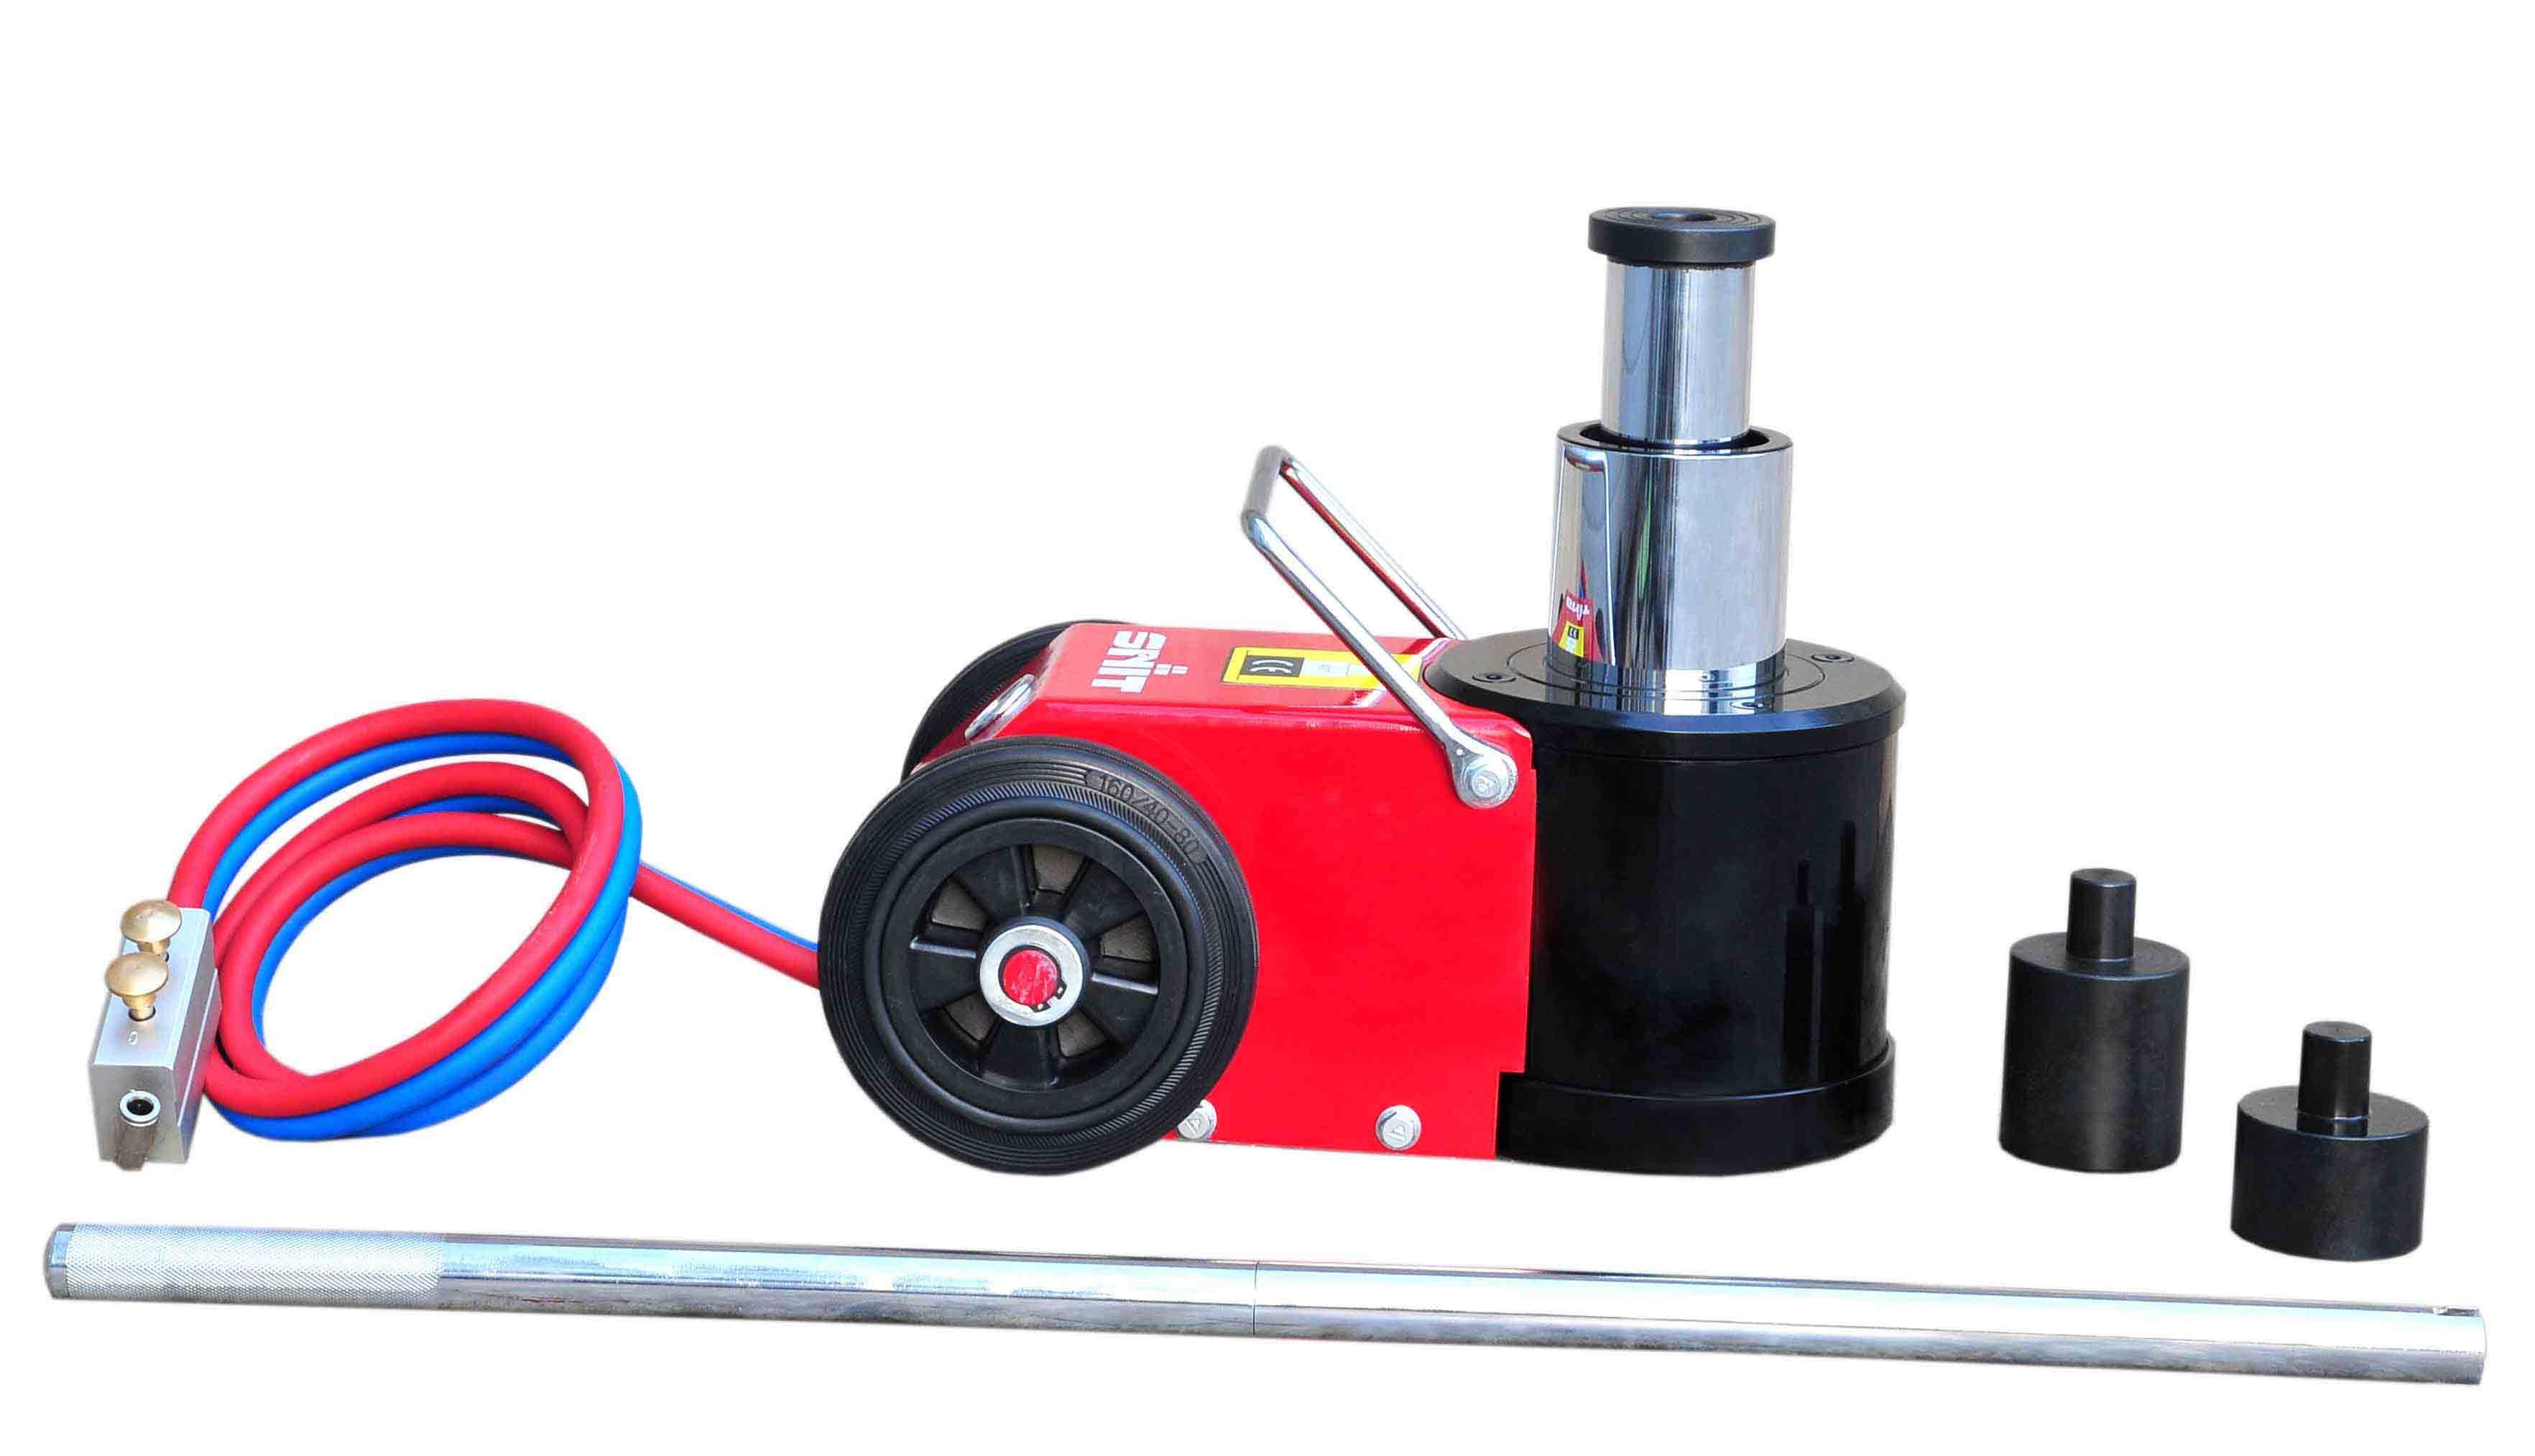 Portable Pneumatic Jack From Fuzhou Snit Mechanical